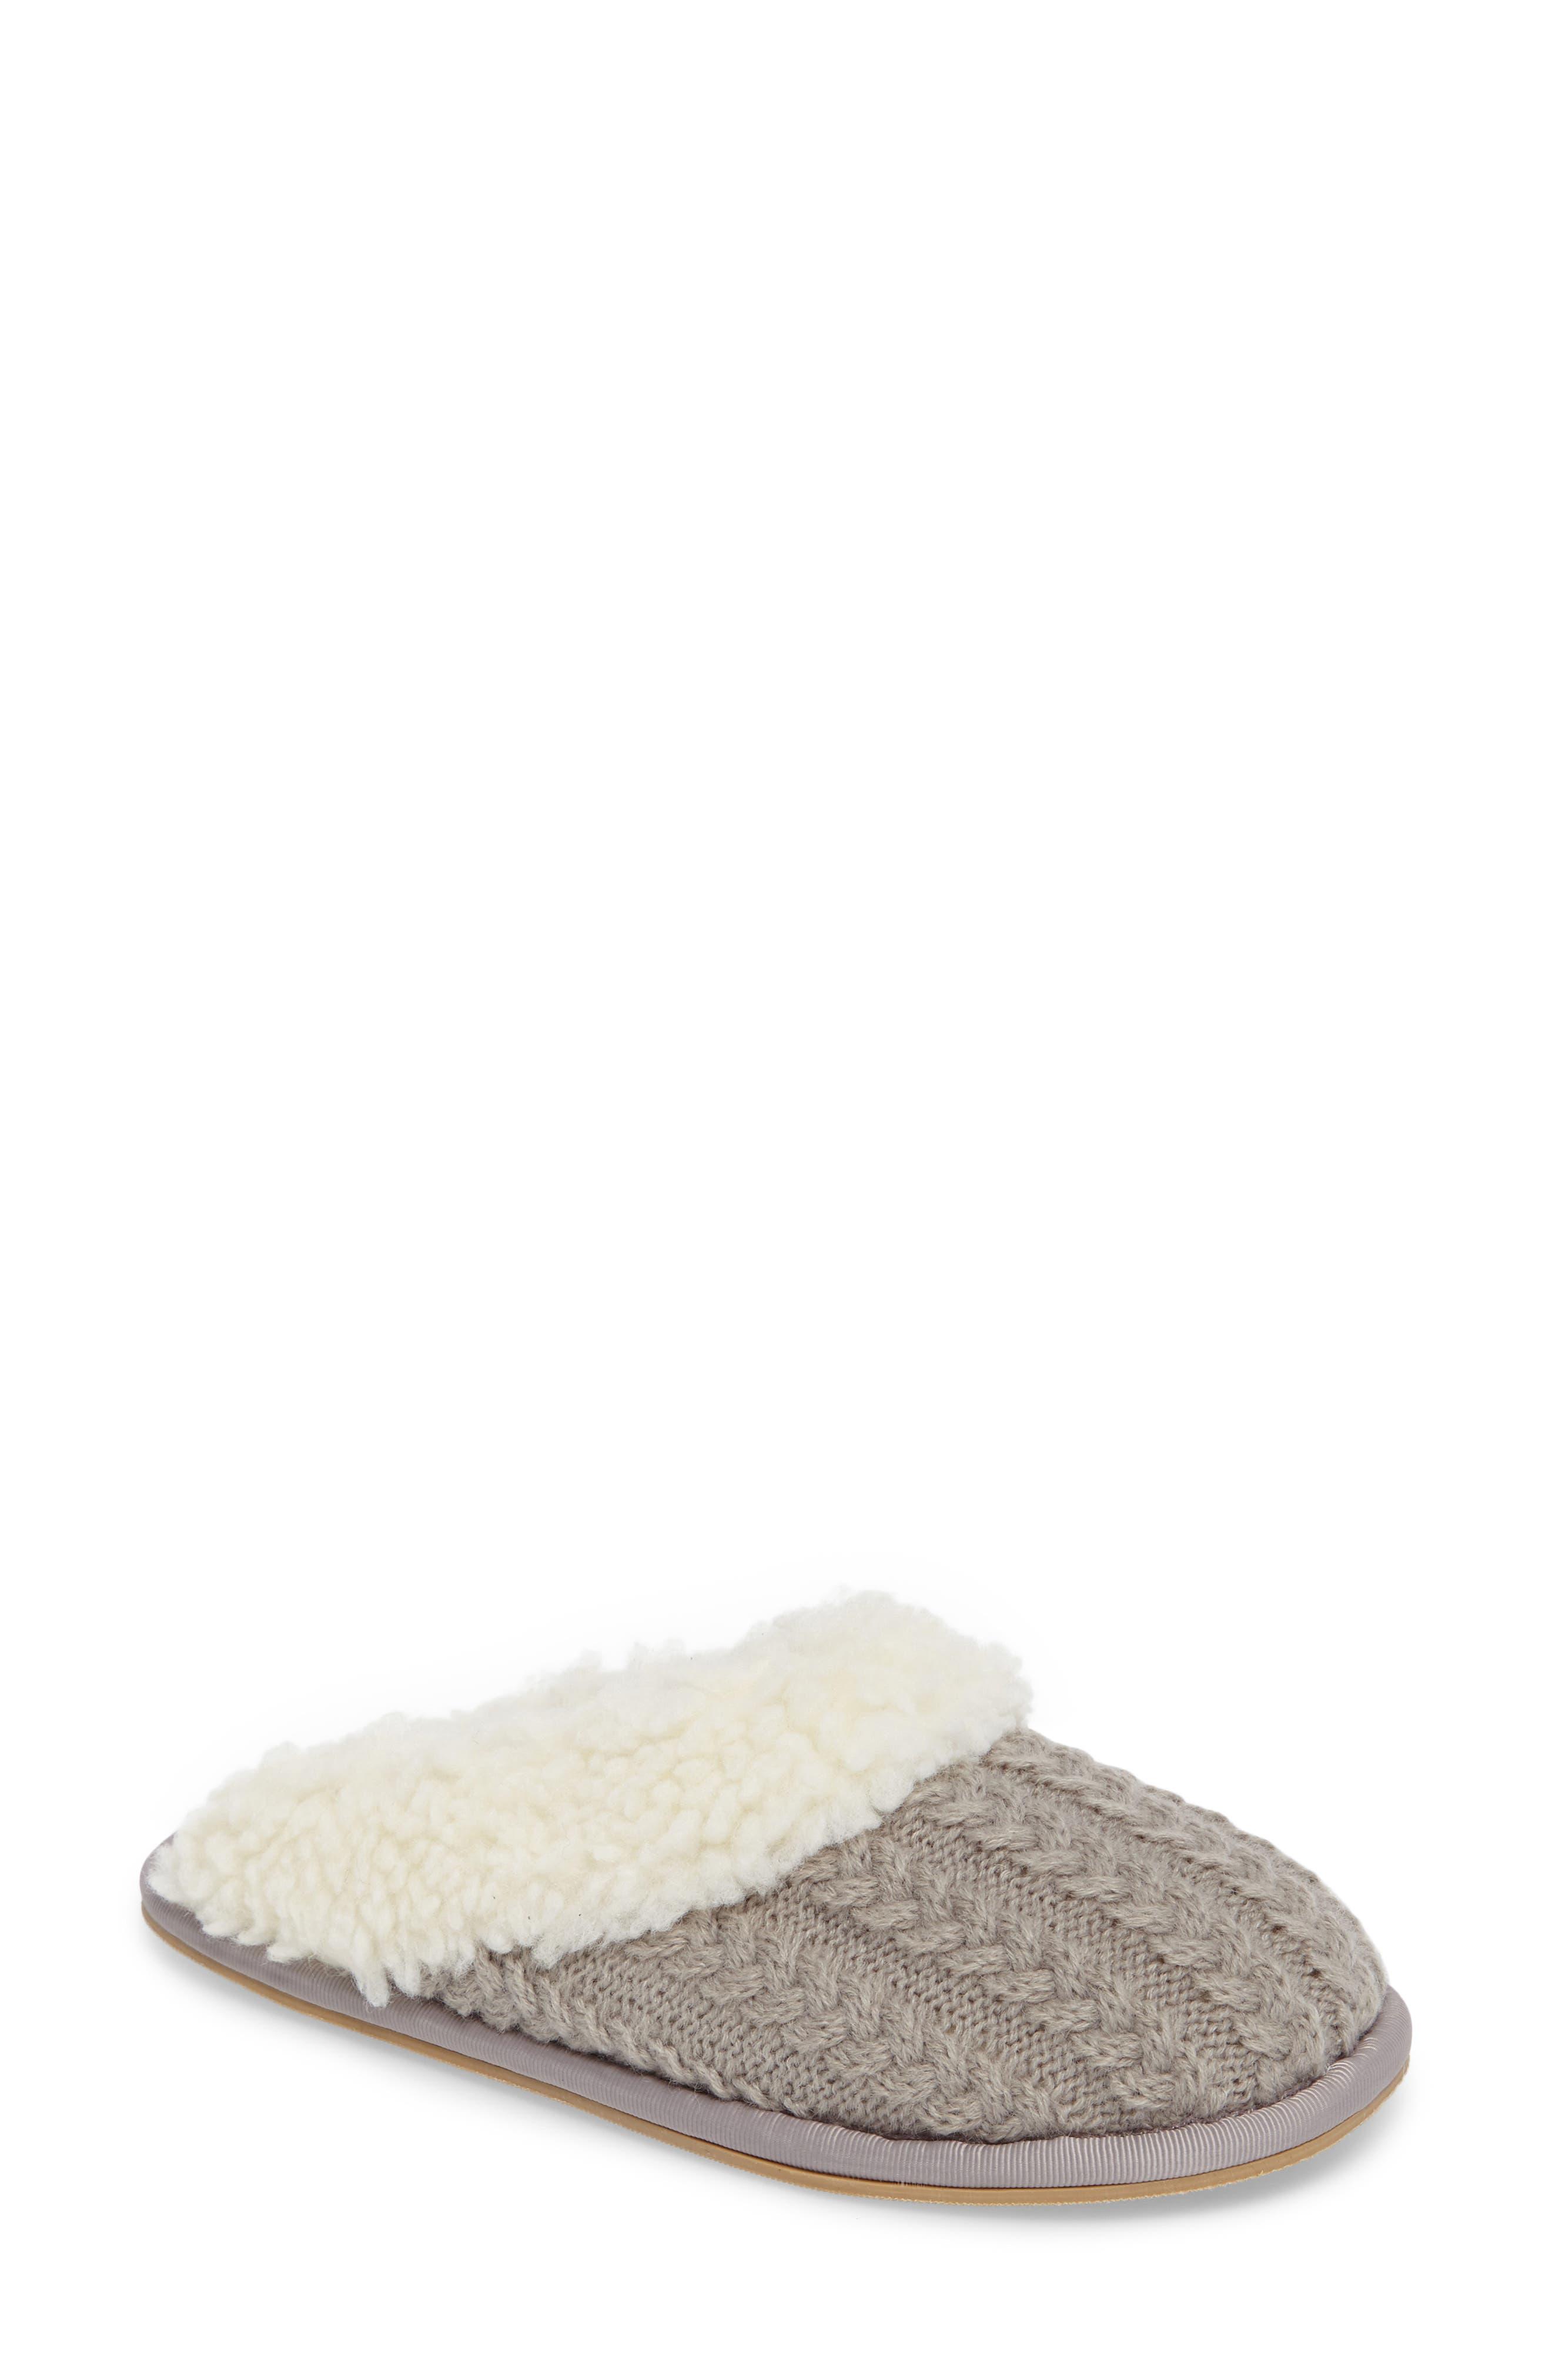 Celia Cable Knit Slipper,                         Main,                         color, Grey Fabric